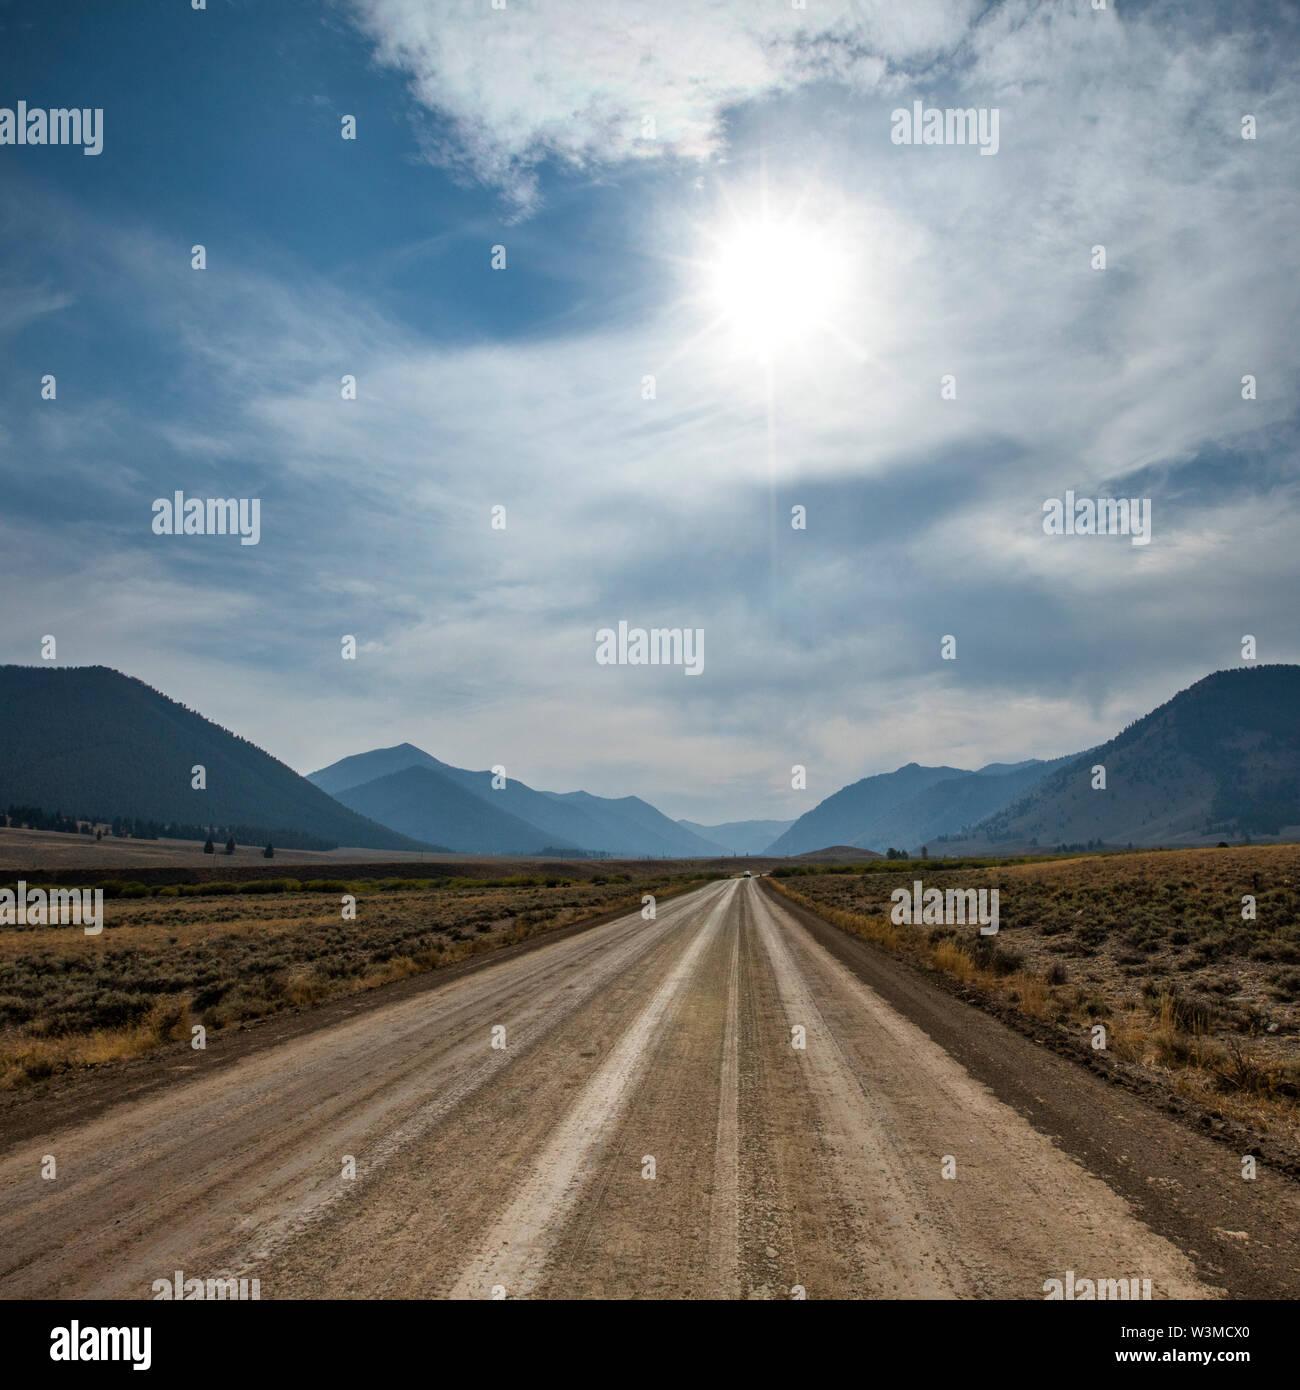 Dirt road through Sun Valley, Idaho, USA - Stock Image